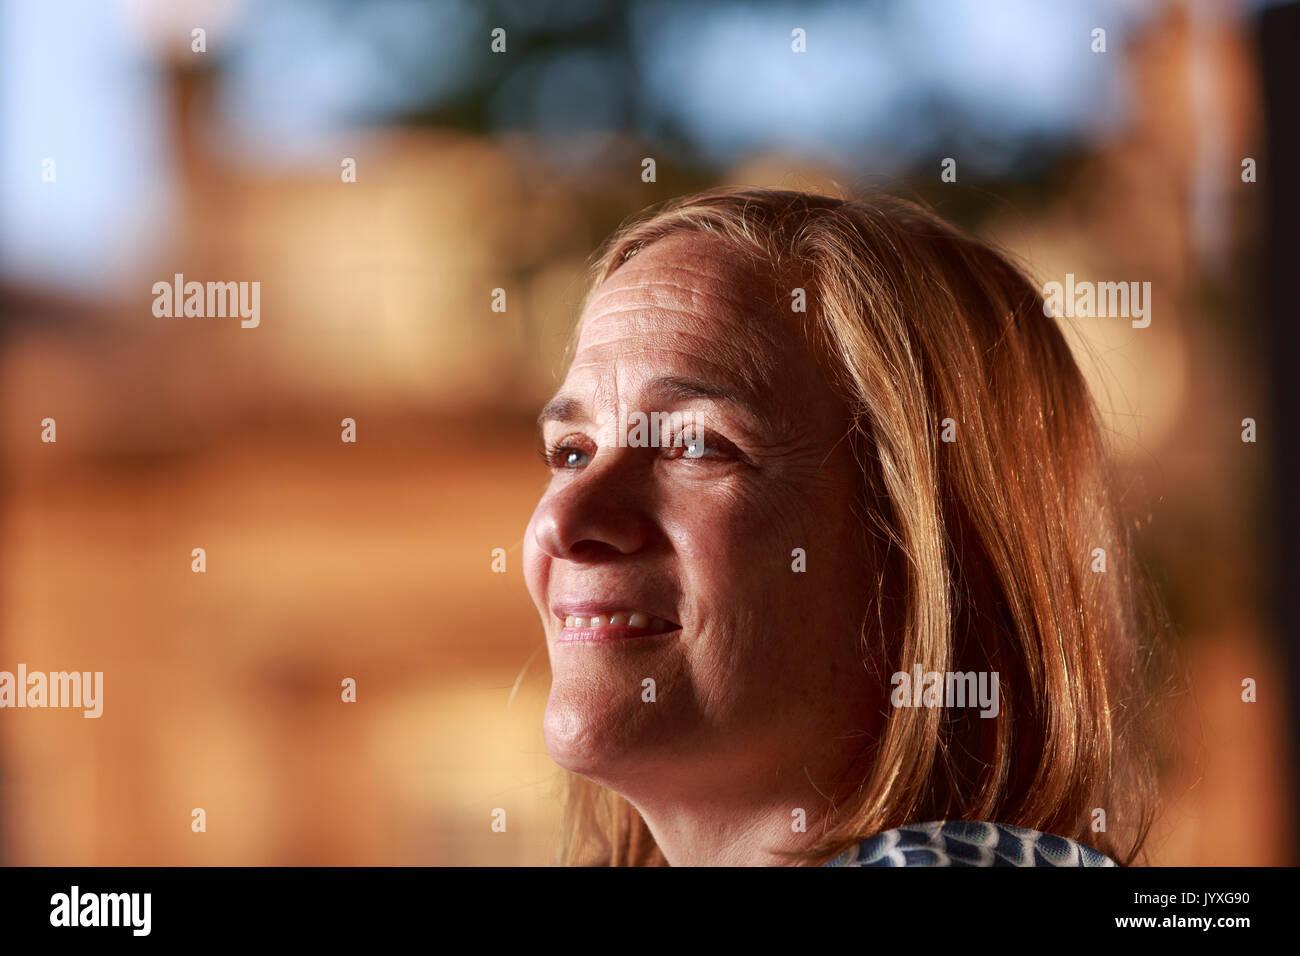 Edinburgh, Scotland, UK. 20th Aug, 2017. Day 9 Edinburgh International Book Festival. Pictured: Tracy Chevalier, American-British historical novelist. She has written eight novels. Credit: Pako Mera/Alamy Live News - Stock Image